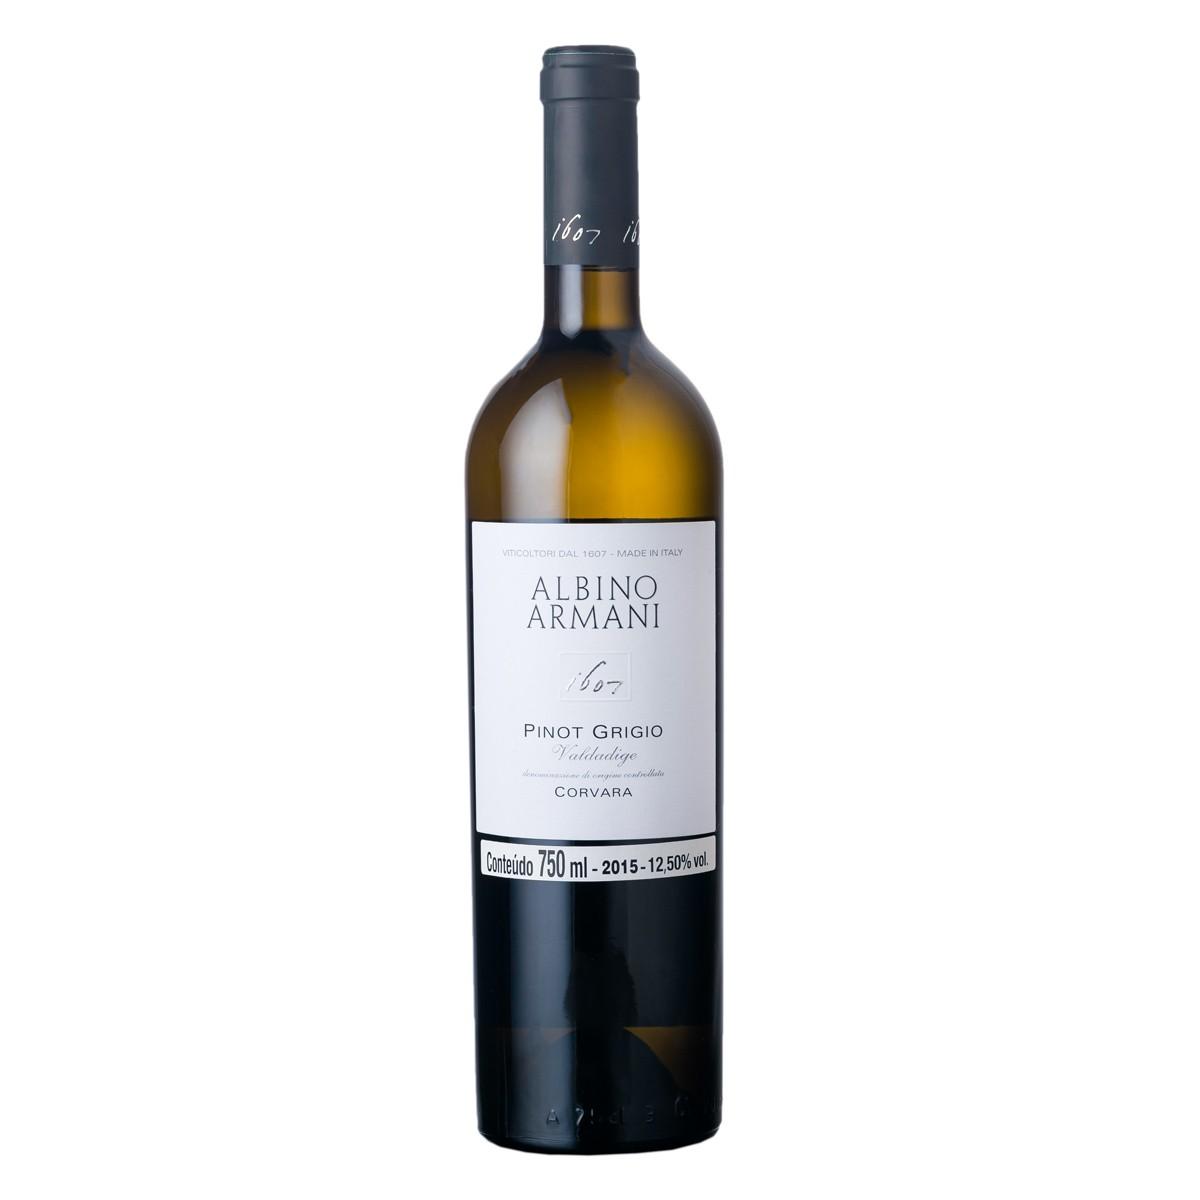 Armani Pinot Grigio Valdadige Vigneto Corvara